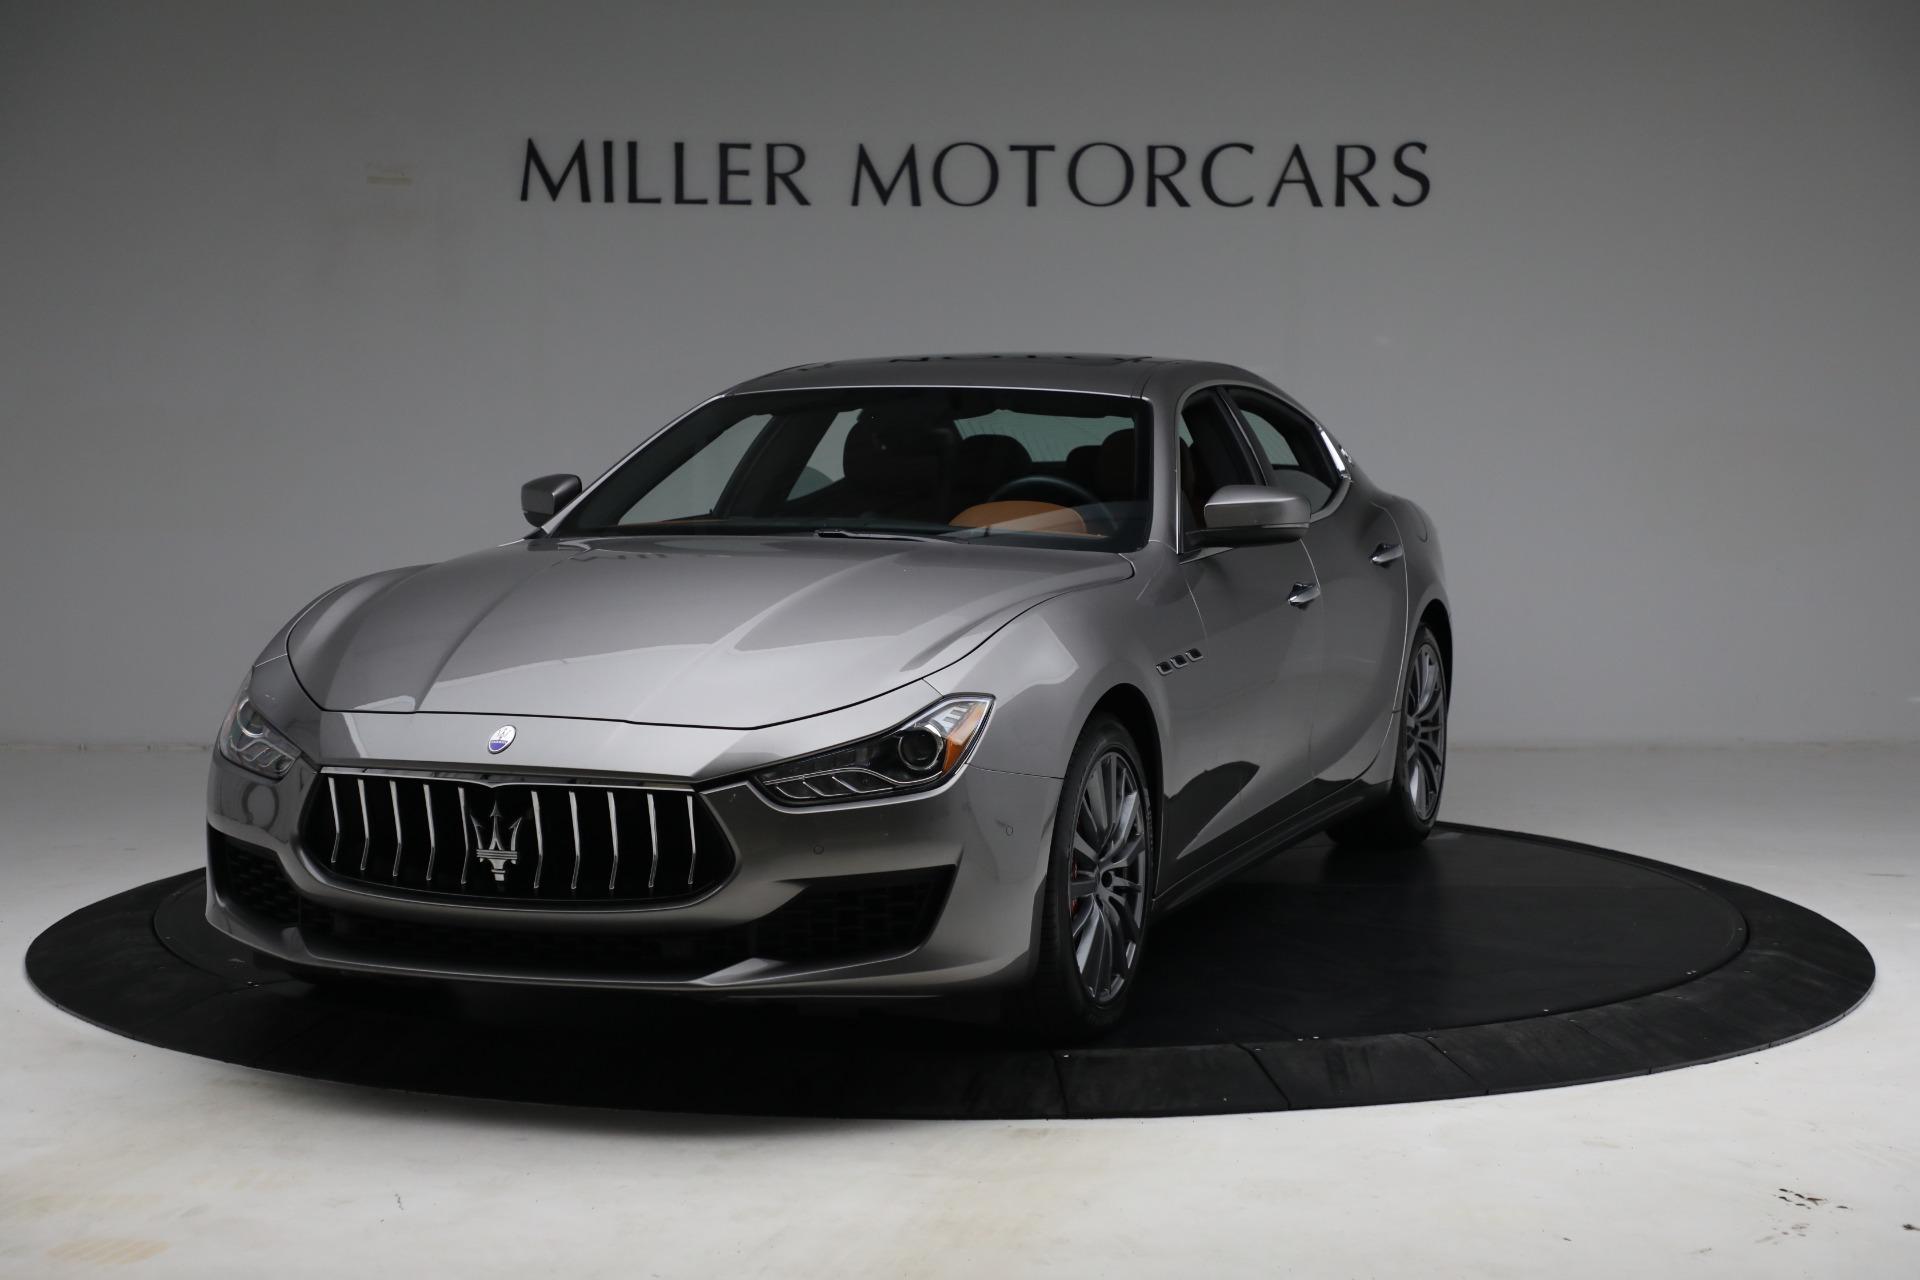 Used 2018 Maserati Ghibli S Q4 for sale $54,900 at Aston Martin of Greenwich in Greenwich CT 06830 1